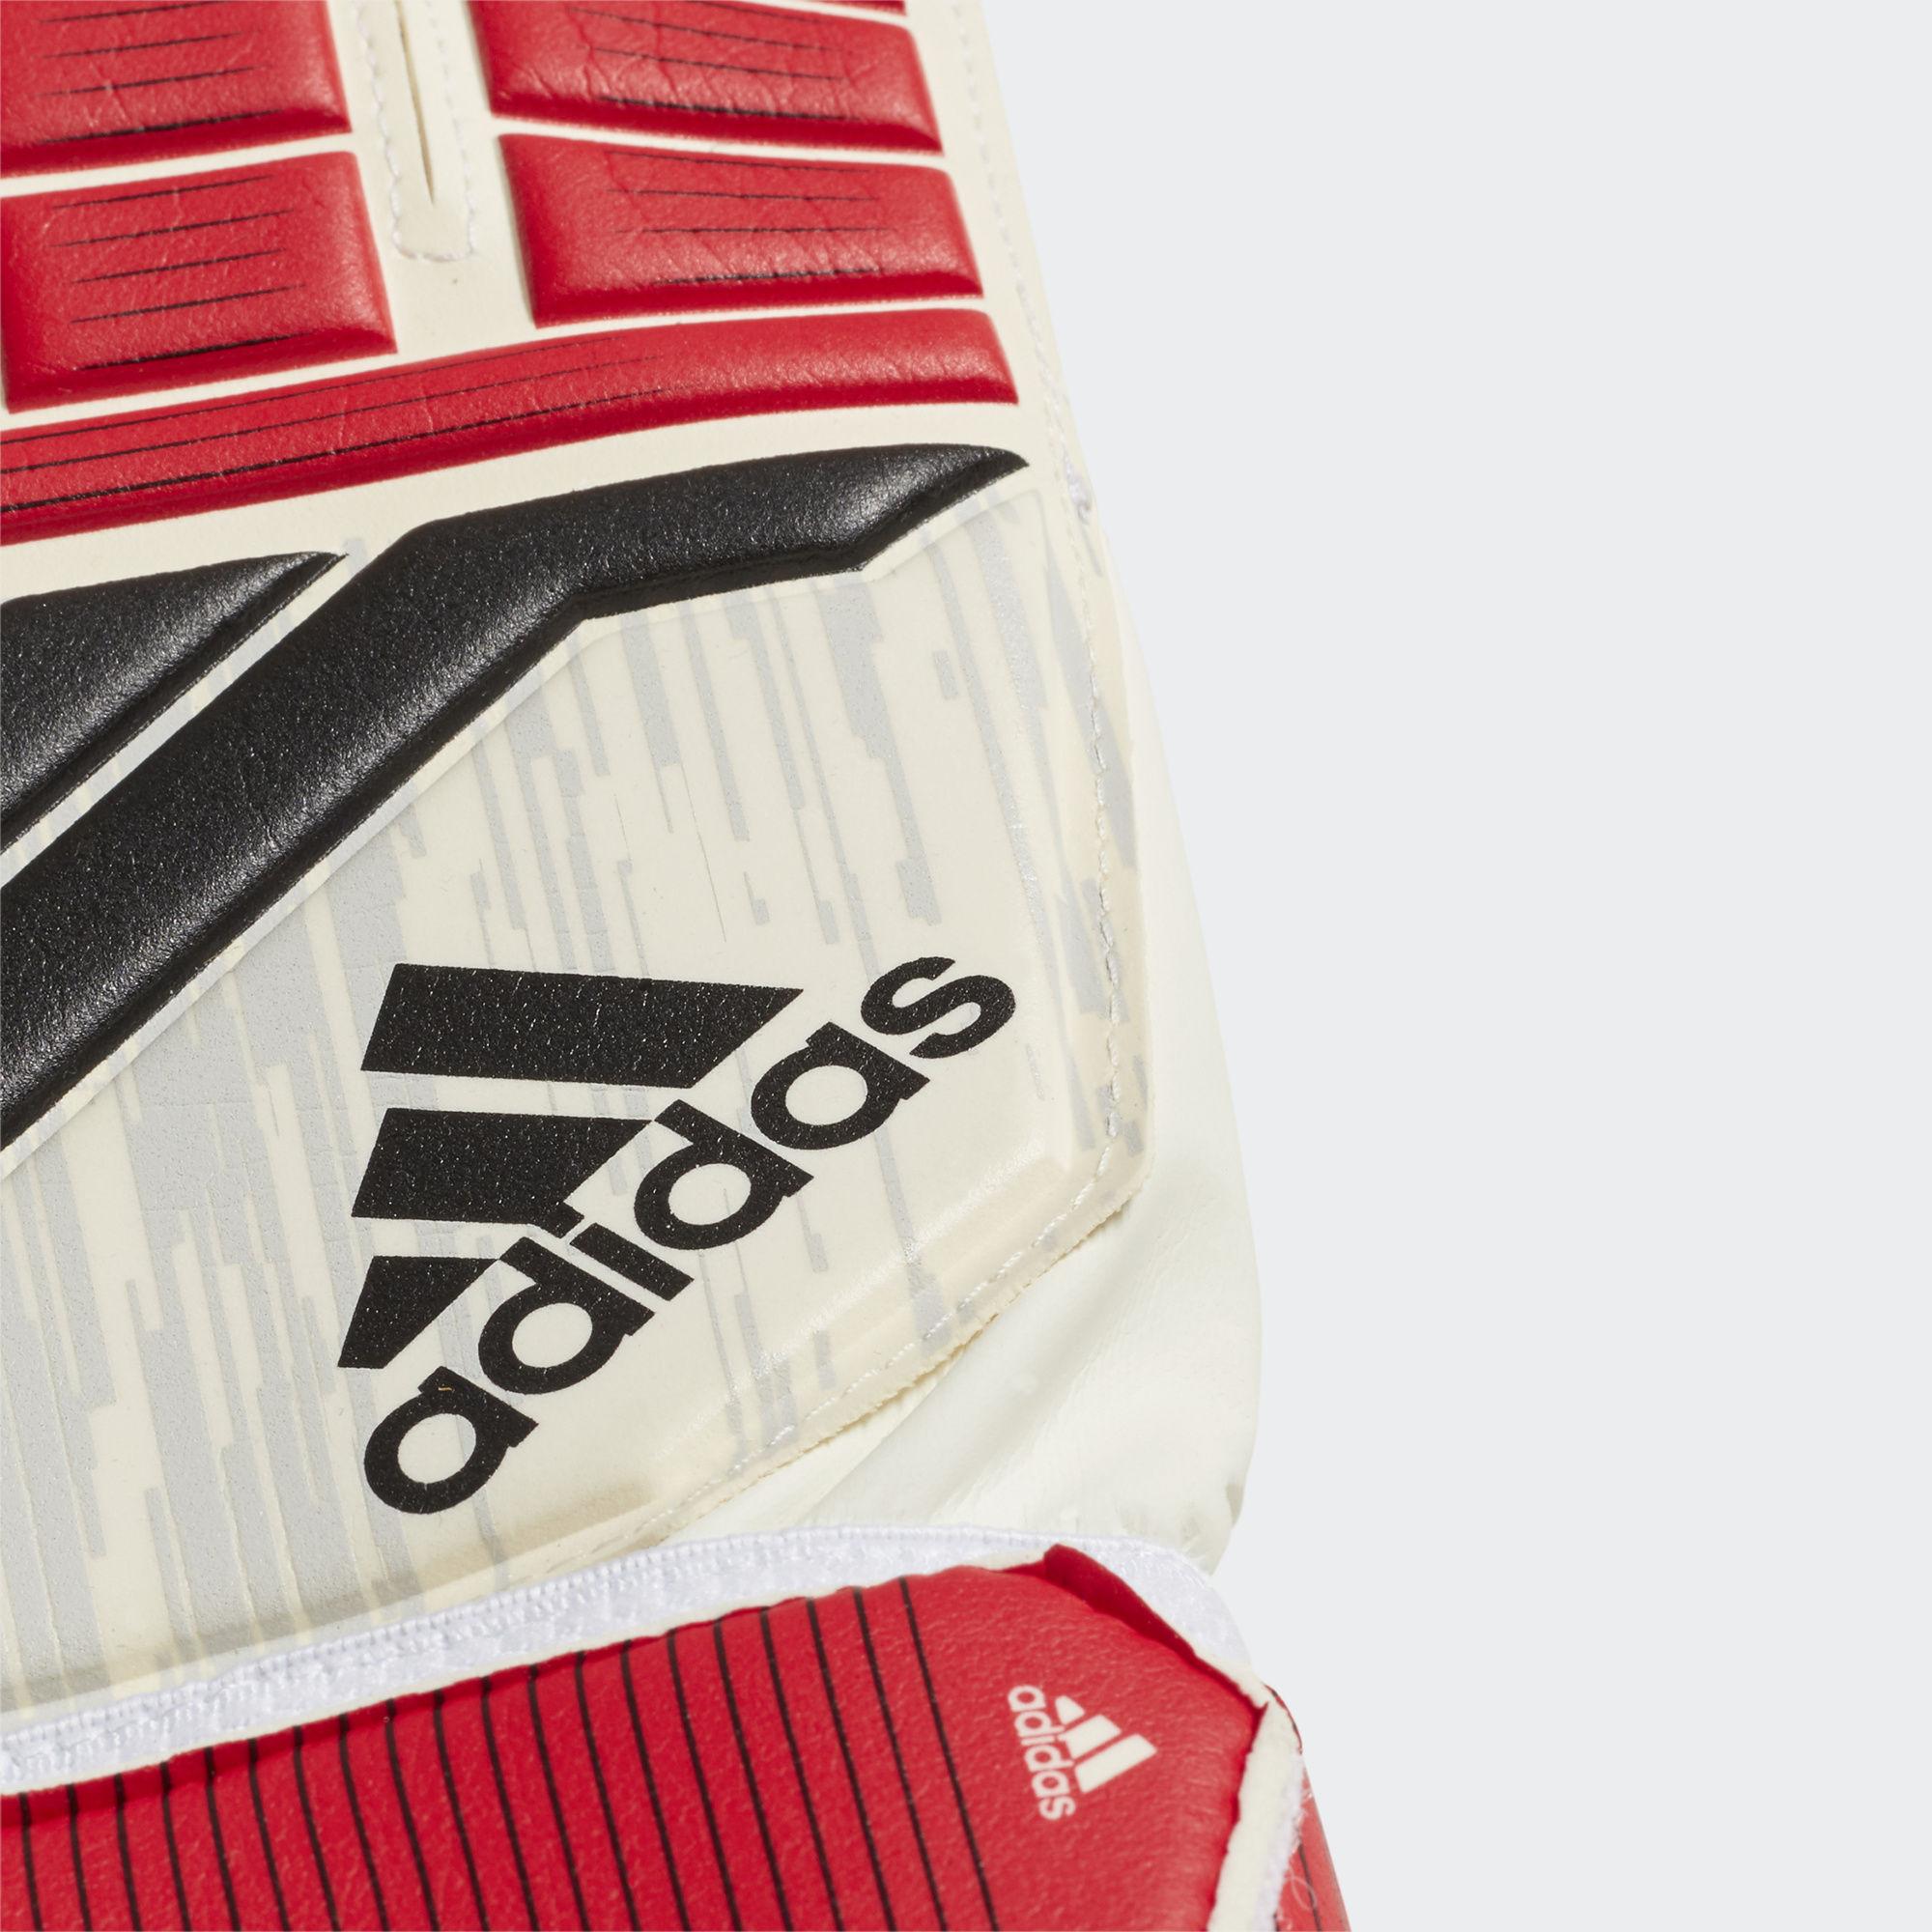 Вратарские перчатки Predator 18 Training CF1366 adidas Performance ... a6dafe4857ac3